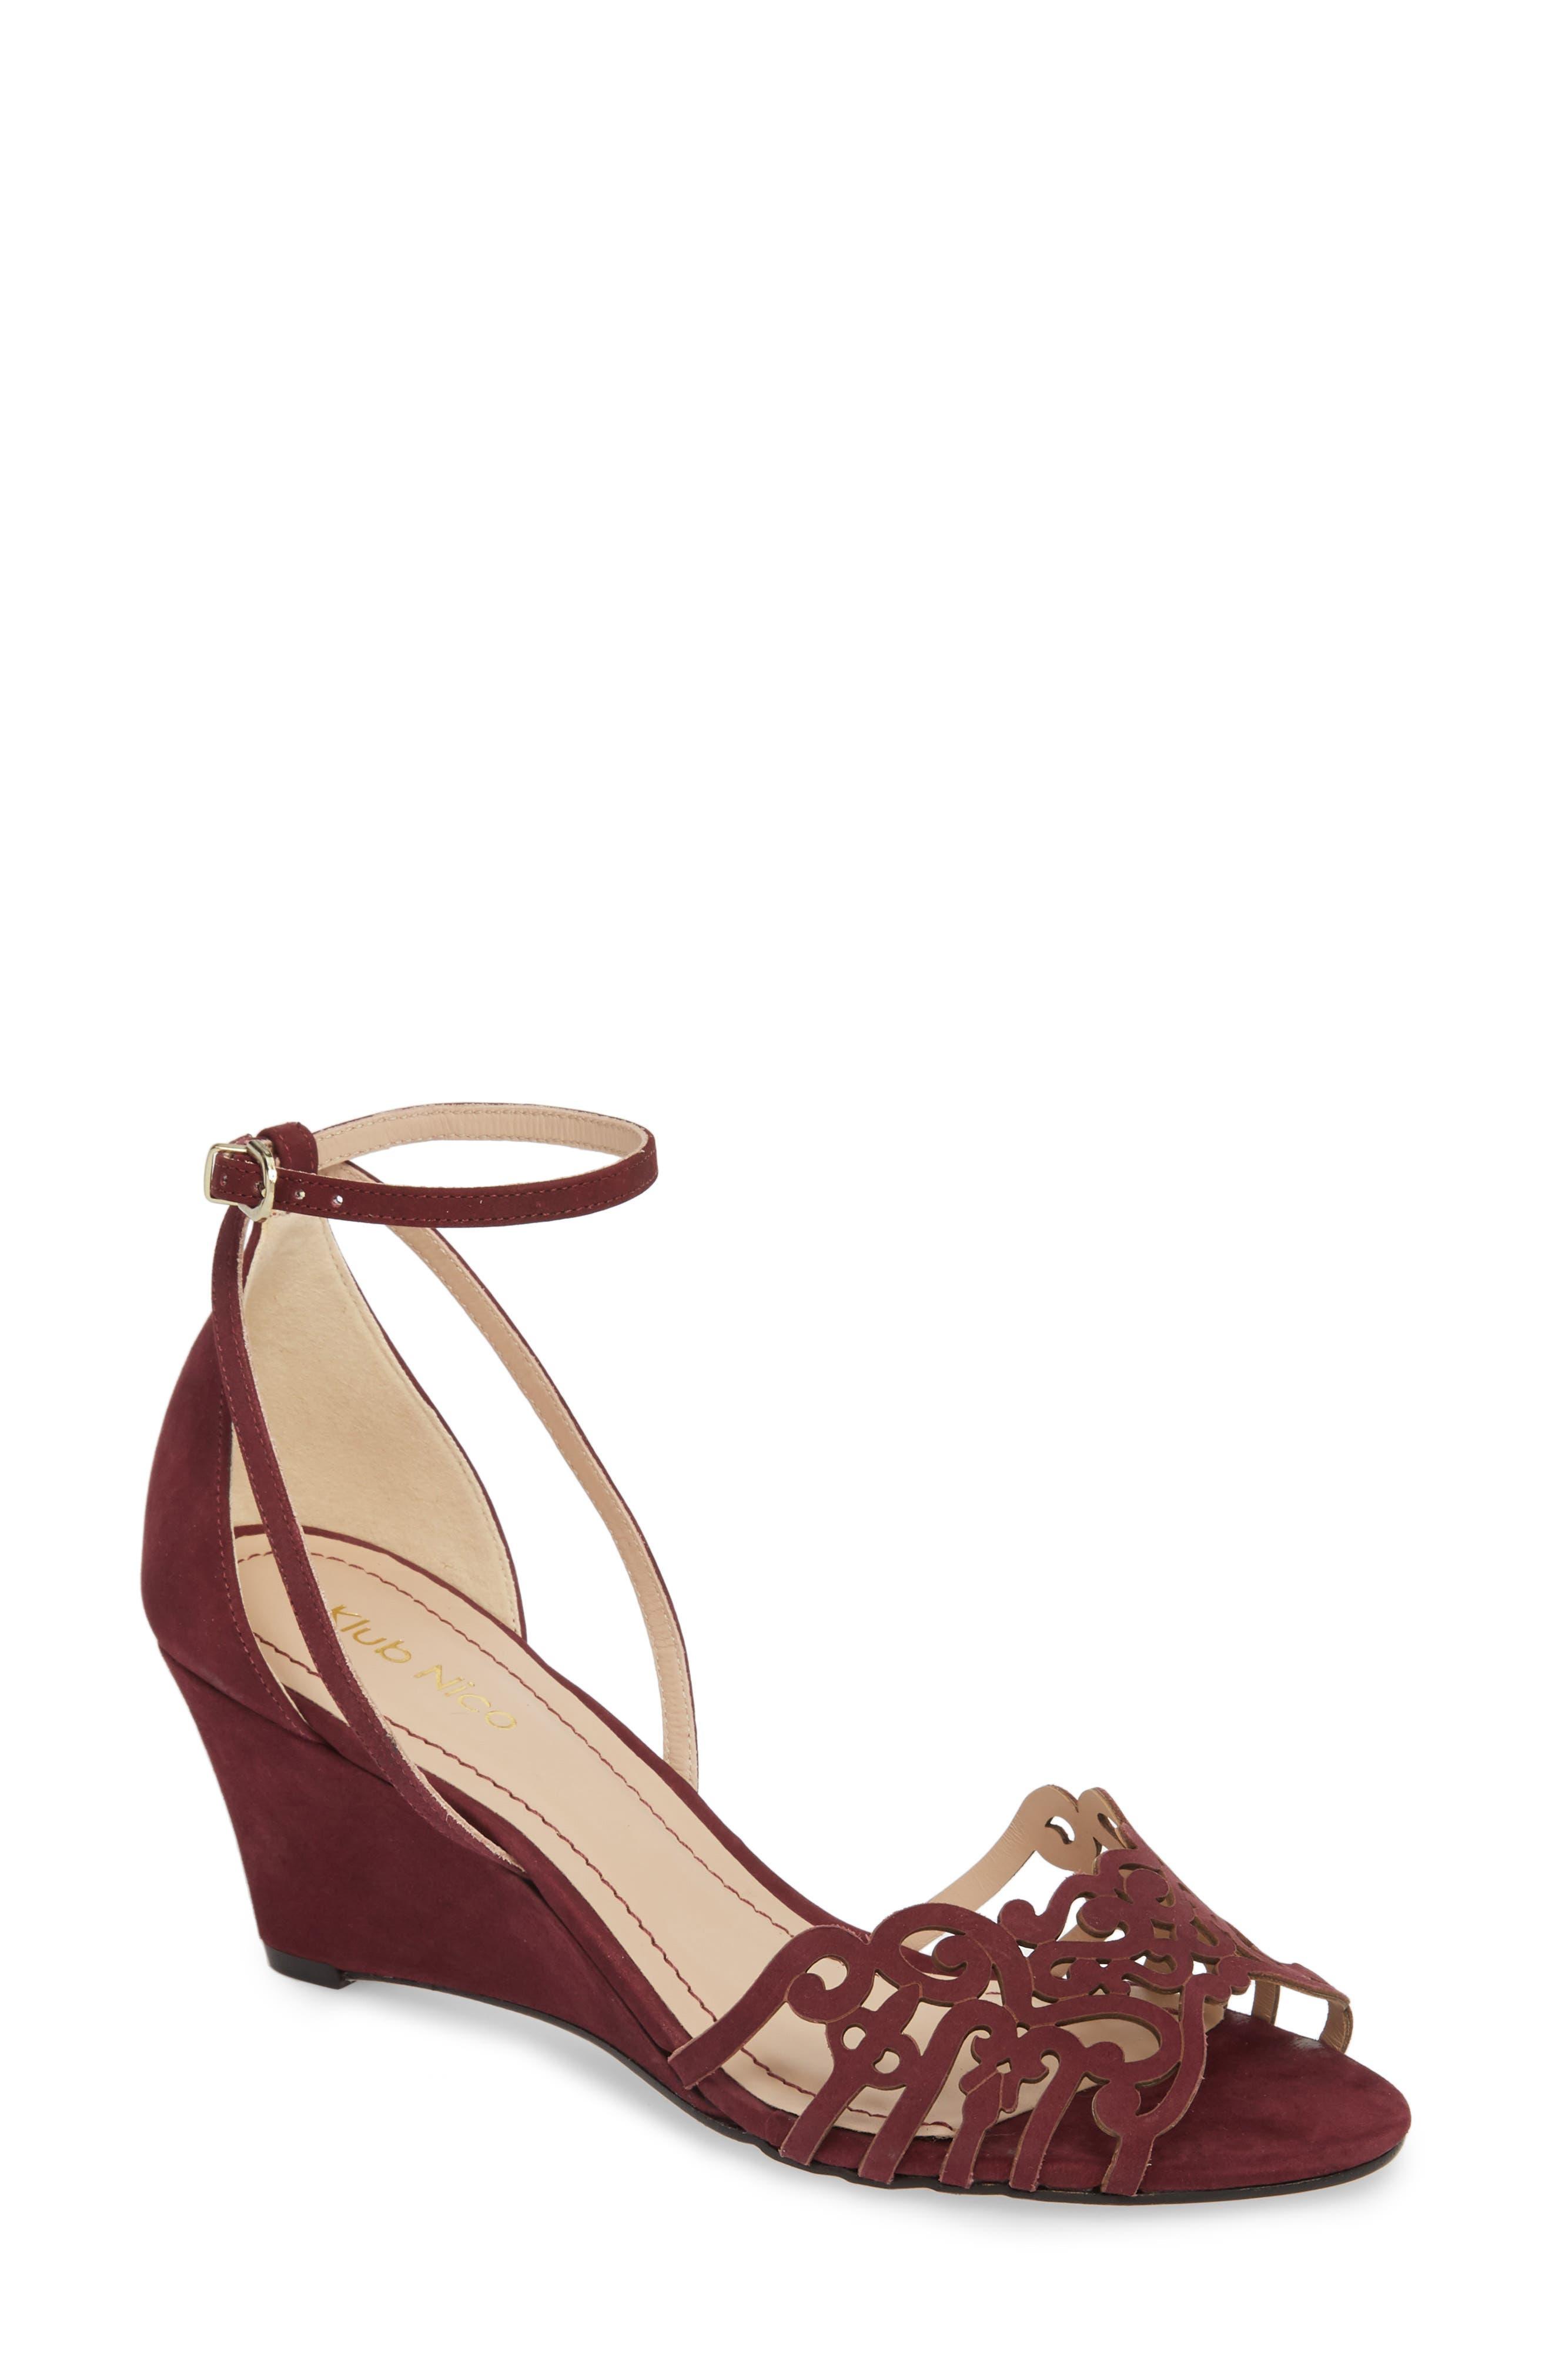 KLUB NICO 'Kingston' Ankle Strap Wedge Sandal, Main, color, WINE LEATHER